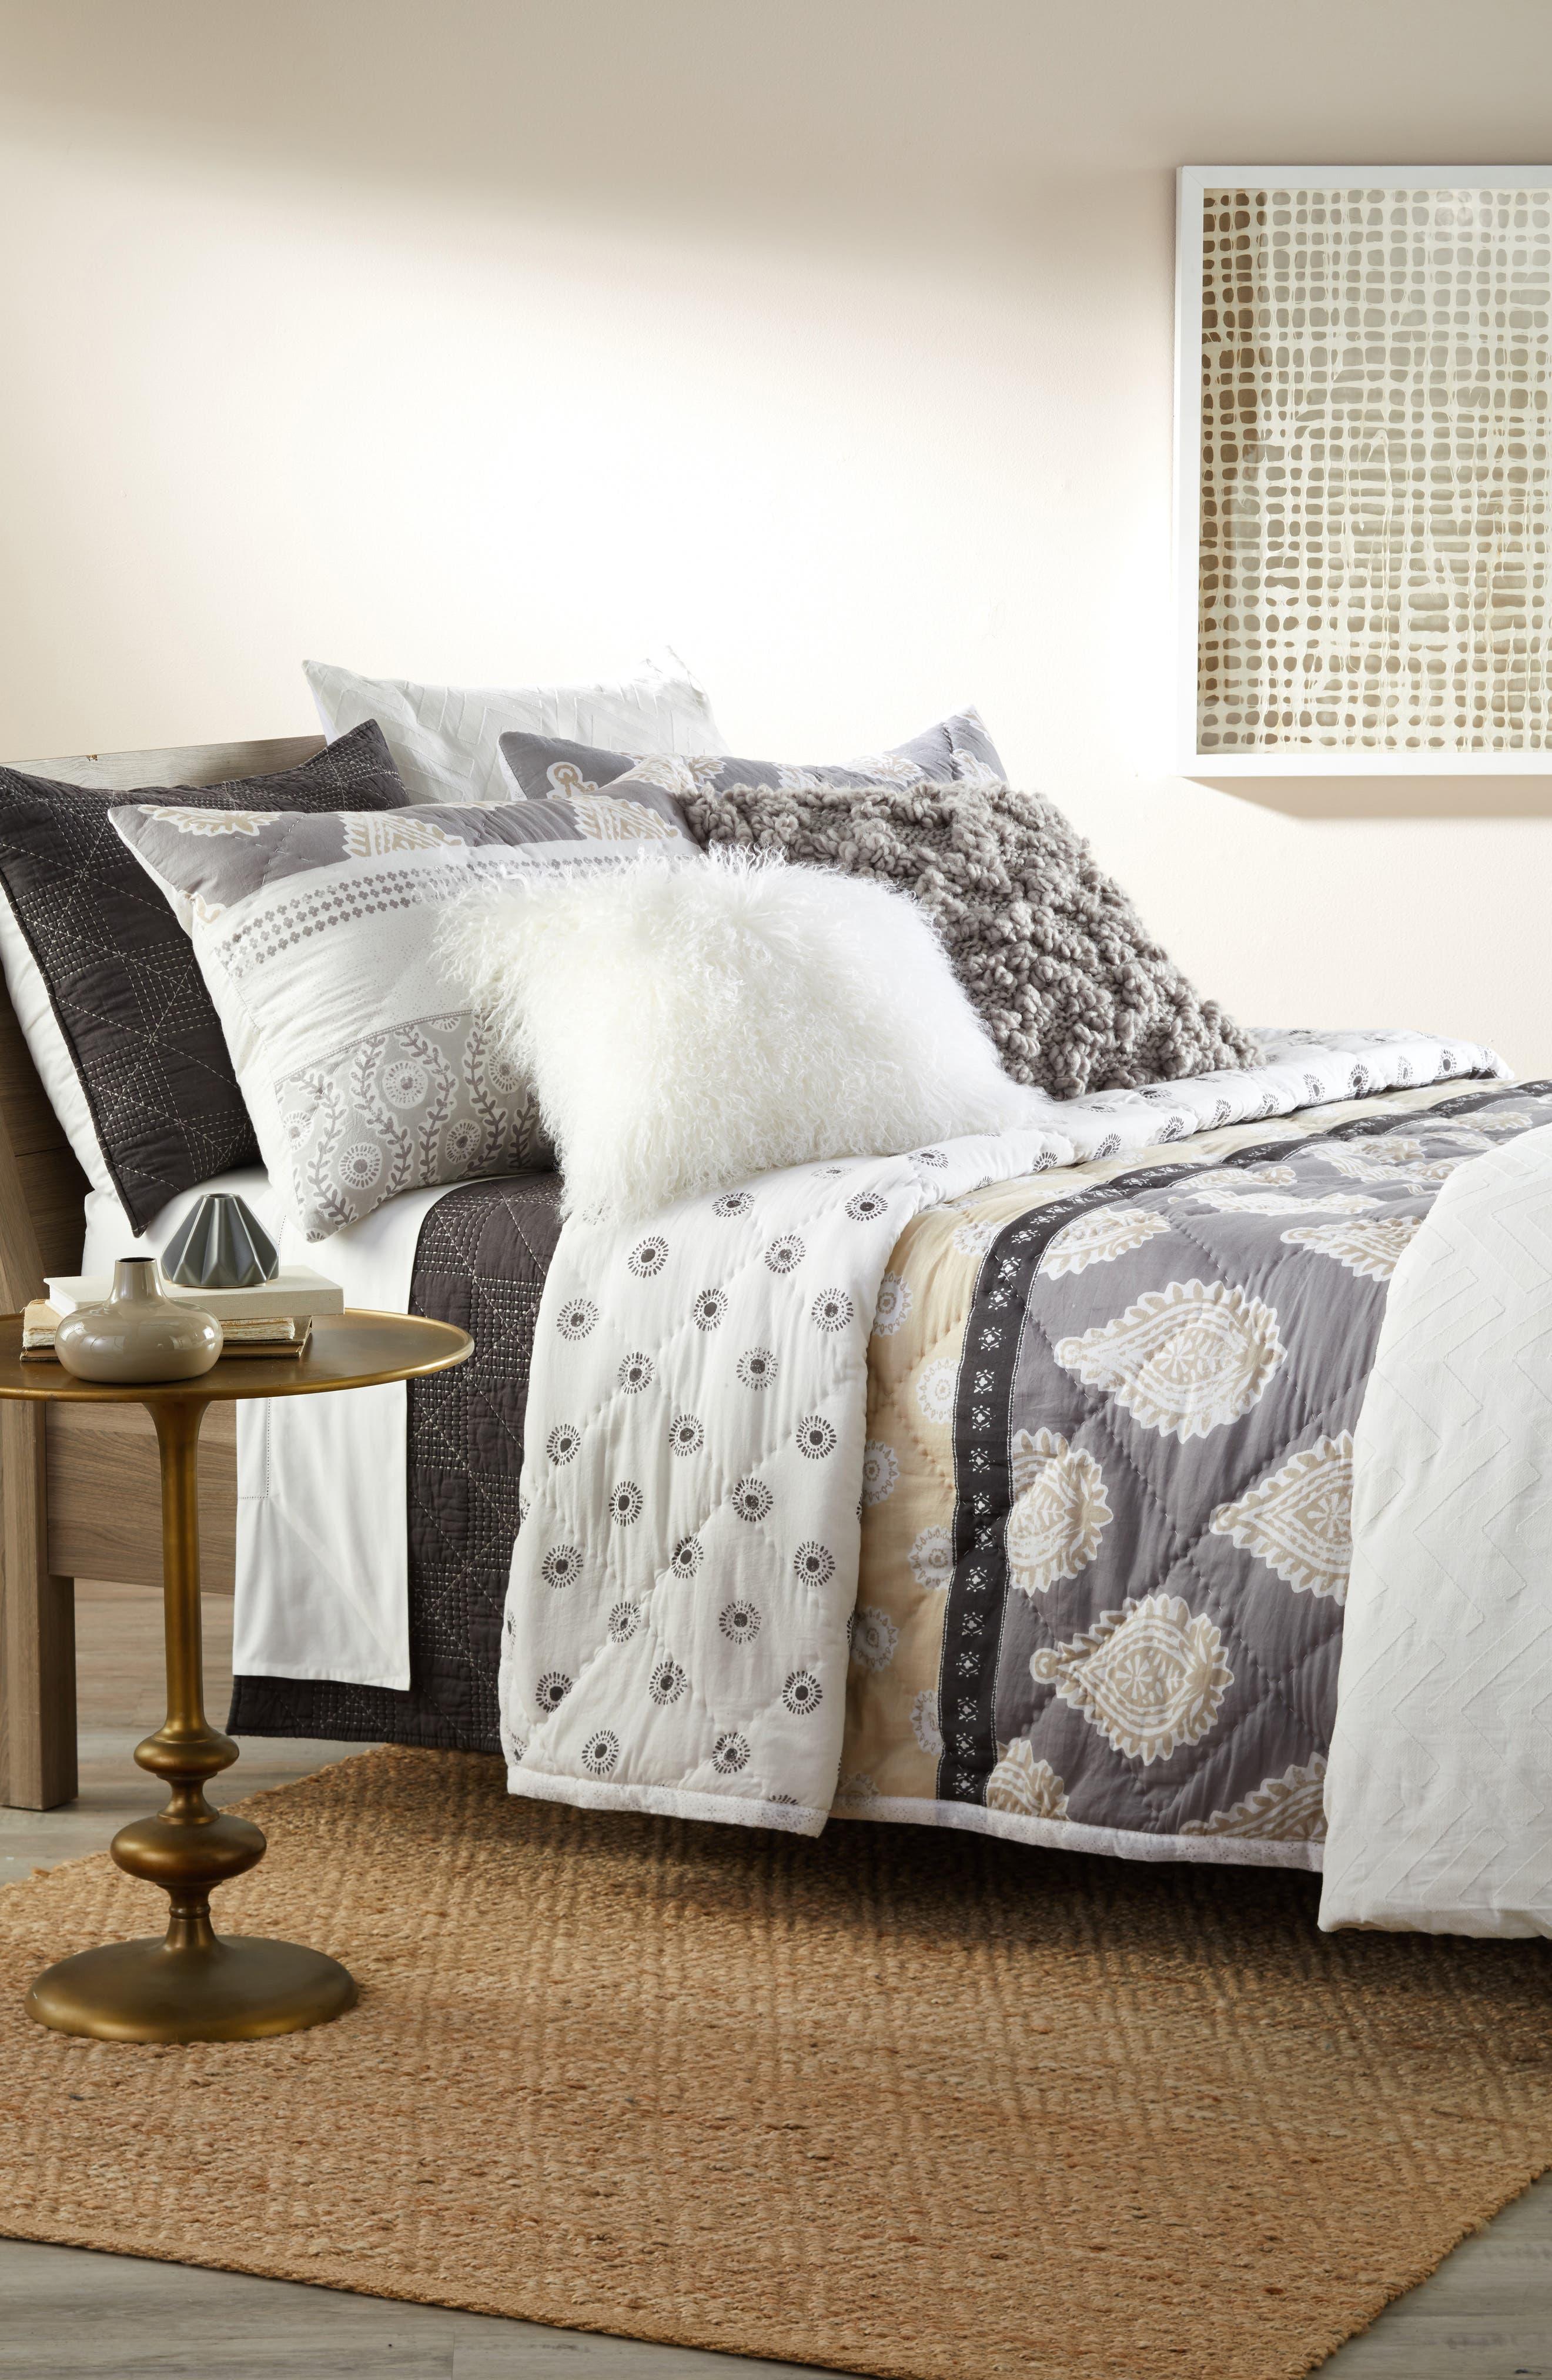 Nordstrom at Home Trellis Duvet & Block Print Comforter Bedding Collection